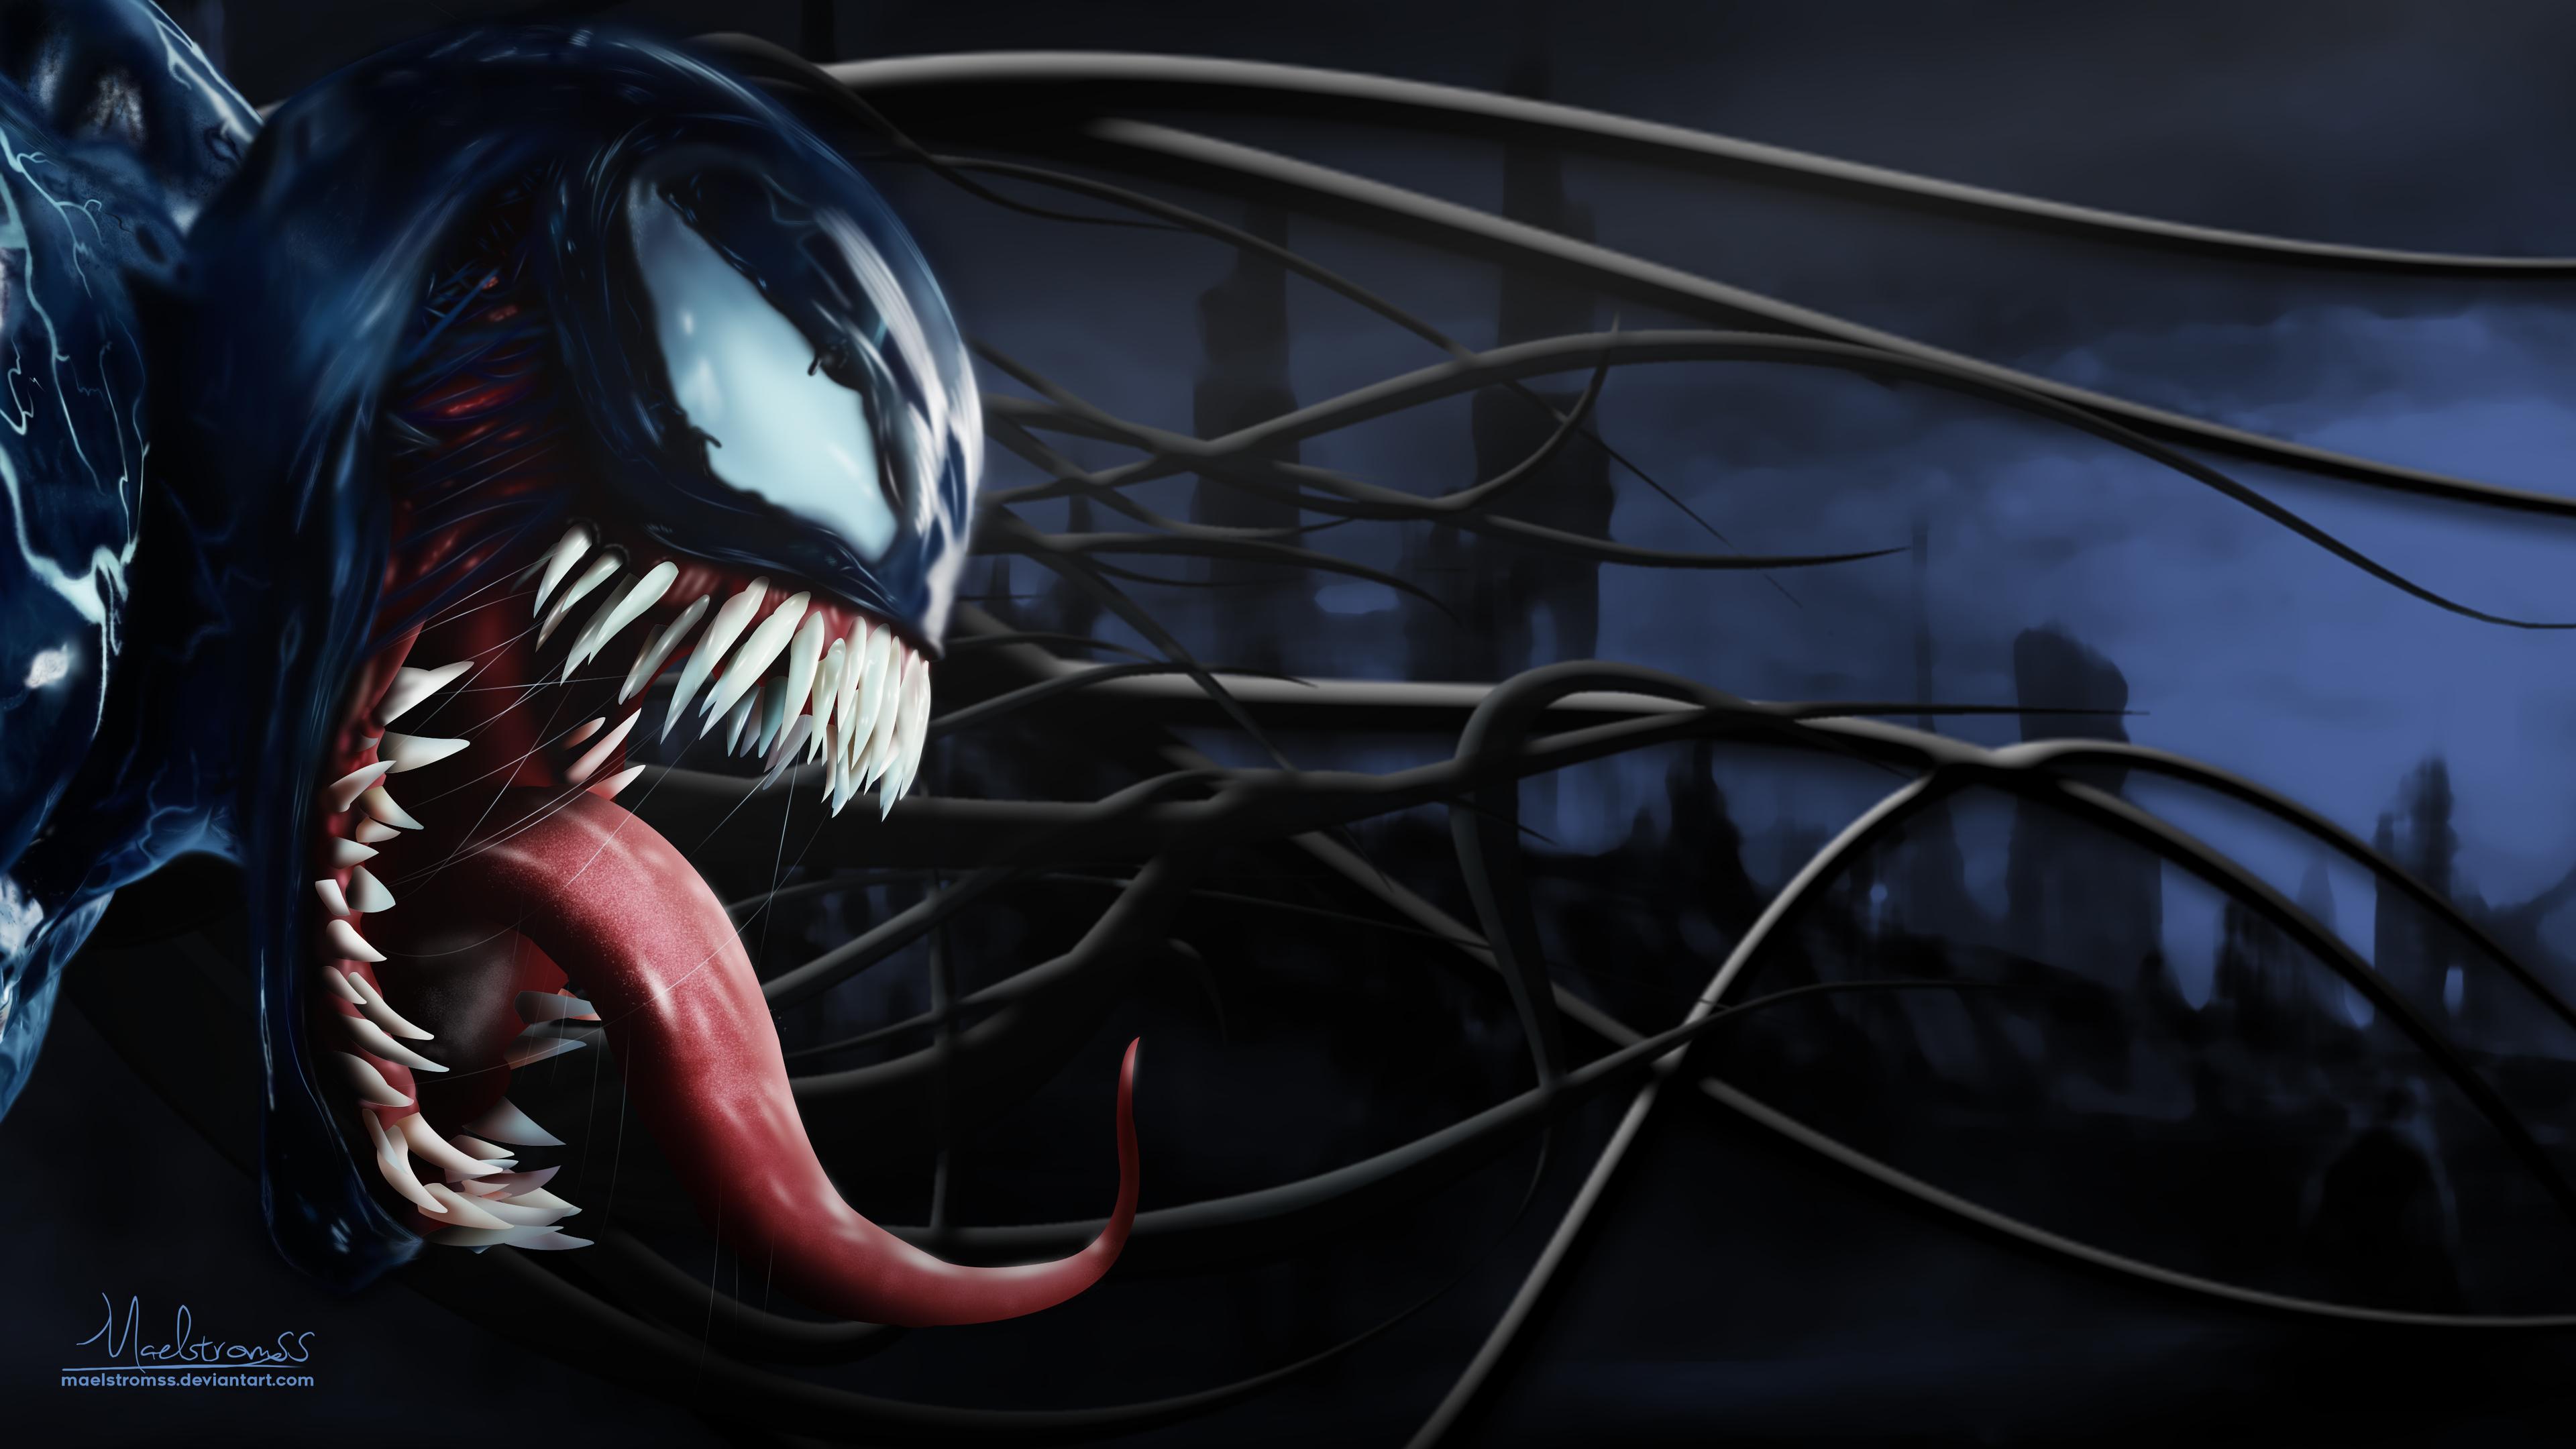 venom 5k artworks 1538786546 - Venom 5k Artworks - Venom wallpapers, venom movie wallpapers, movies wallpapers, hd-wallpapers, deviantart wallpapers, artwork wallpapers, artist wallpapers, 5k wallpapers, 4k-wallpapers, 2018-movies-wallpapers